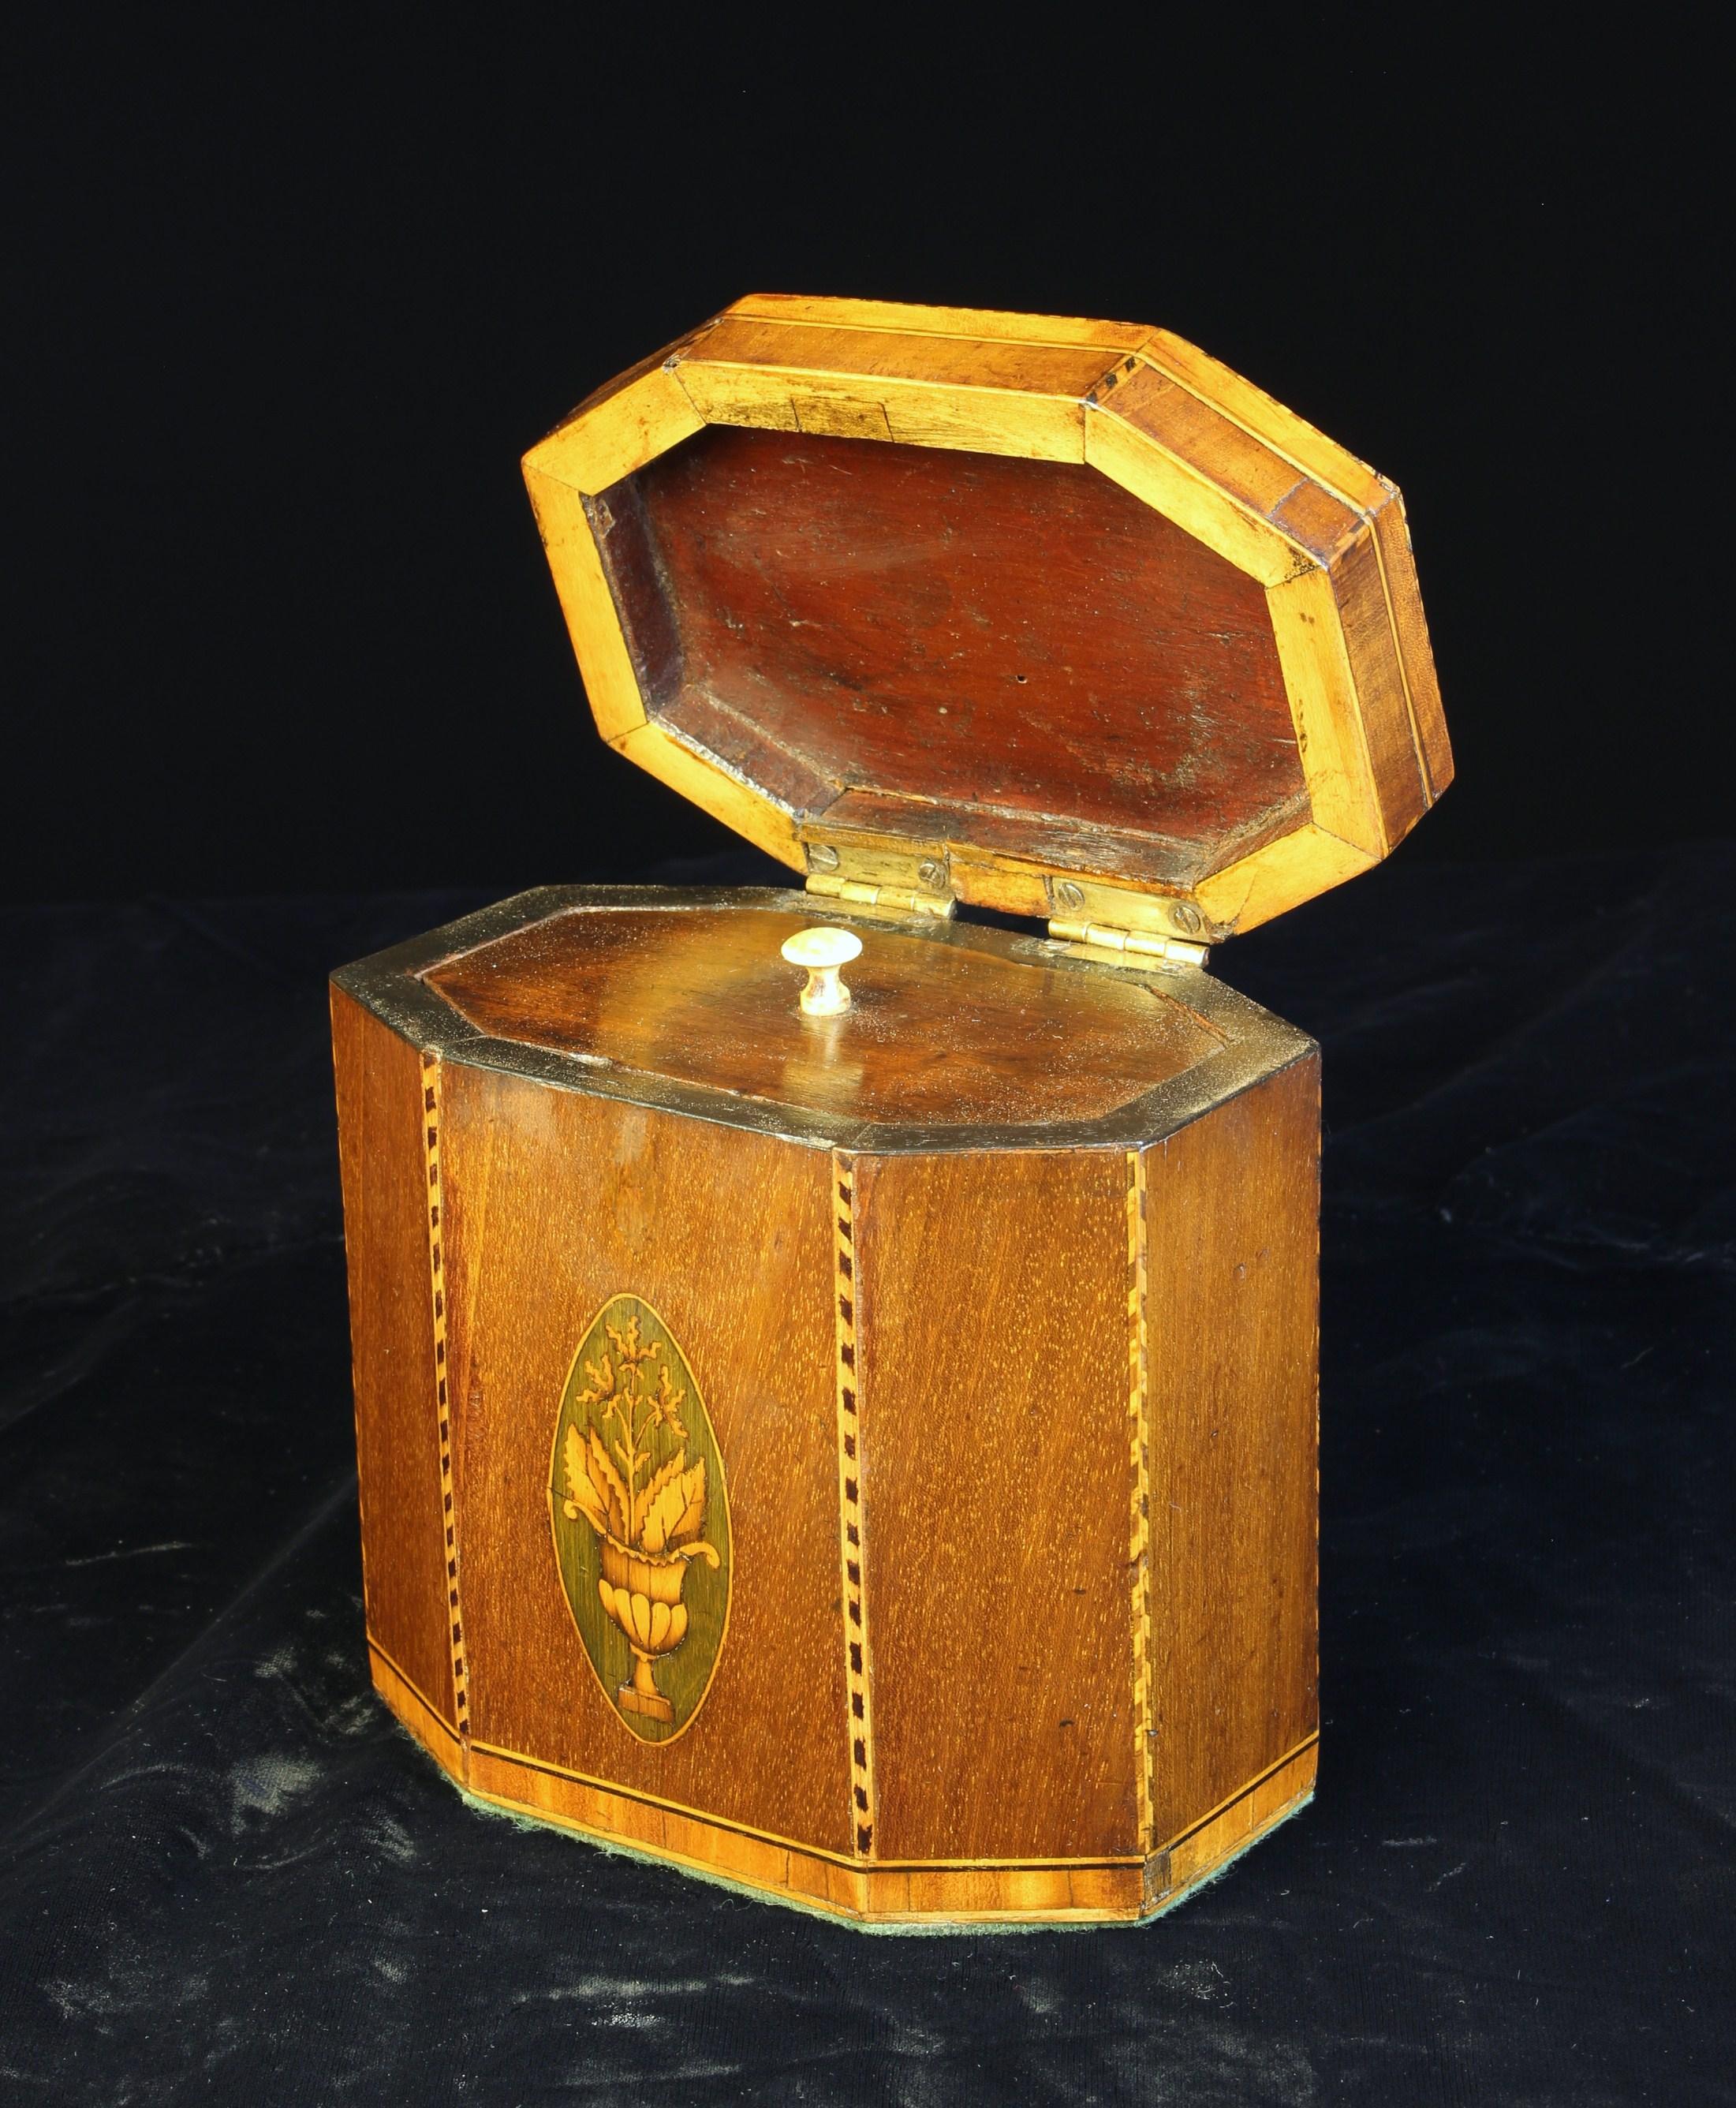 A George III Mahogany & Satinwood-banded Tea Caddy of octagonal form. - Image 3 of 3